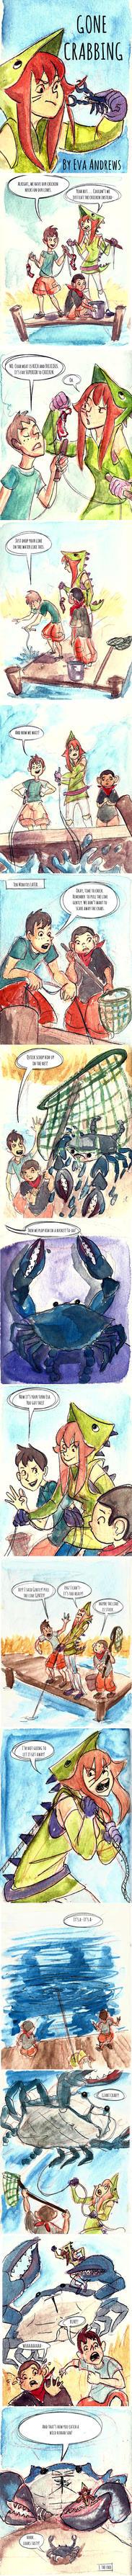 Gone Crabbing by l-Ataraxia-l